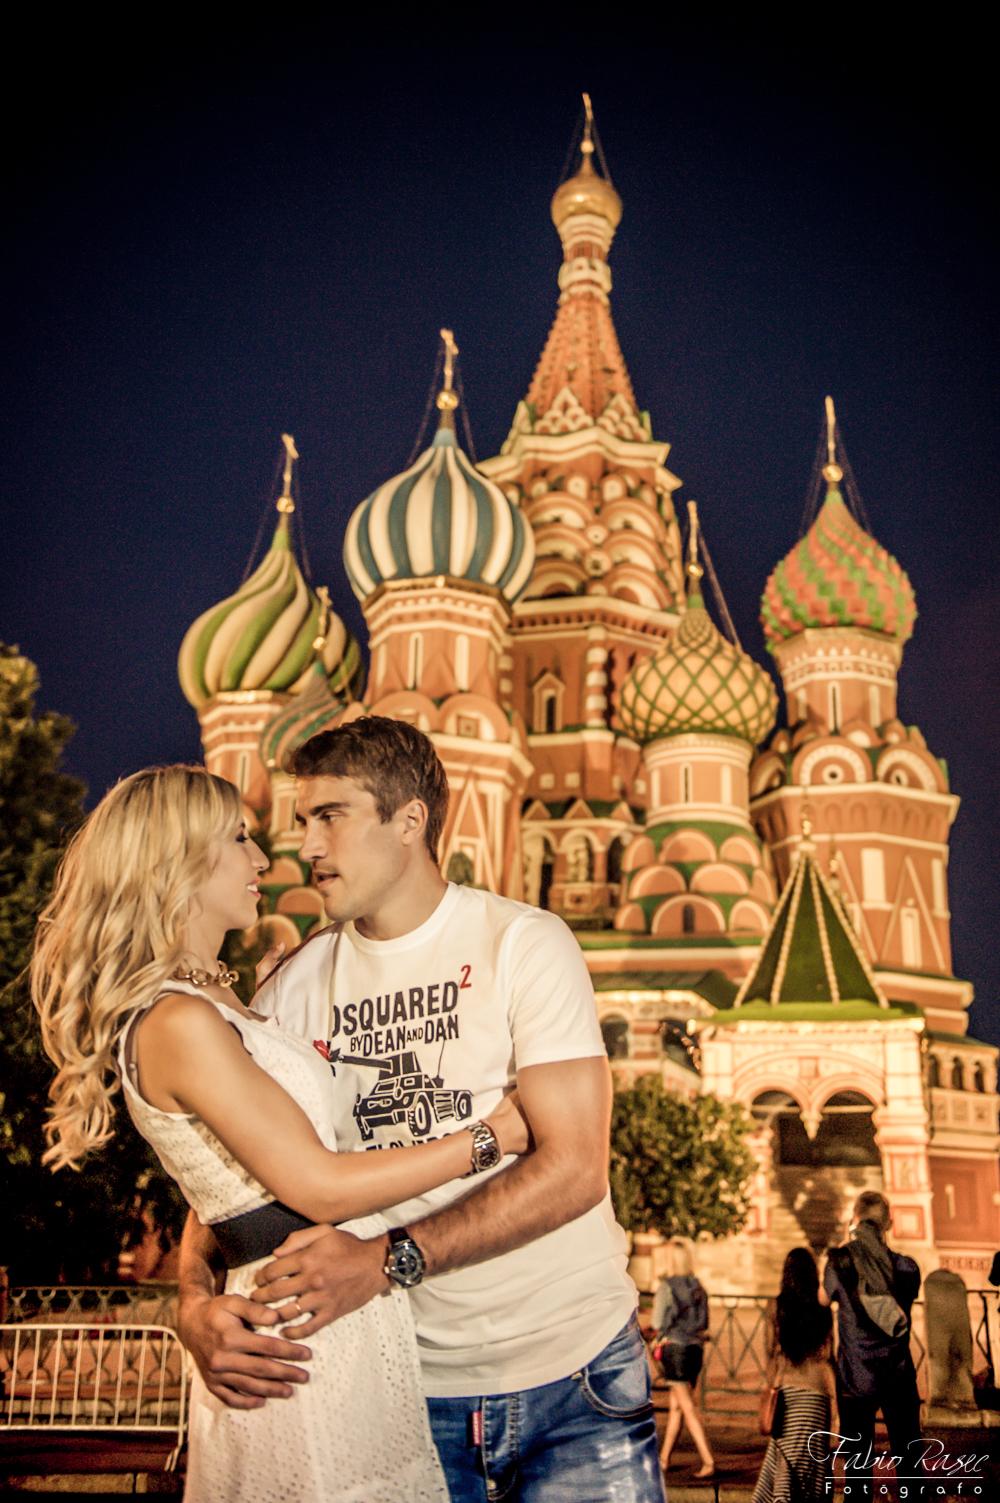 Fotógrafo de Casamento RJ-19, Ensaio-Fotografico-Kremlin-Ensaio-Fotografico-Moscou-Ensaio-Fotografico-Russia-Pre-Wedding-Moscow-Pré-Wedding-RJ-Pre-Wedding-Russia-фотографиче